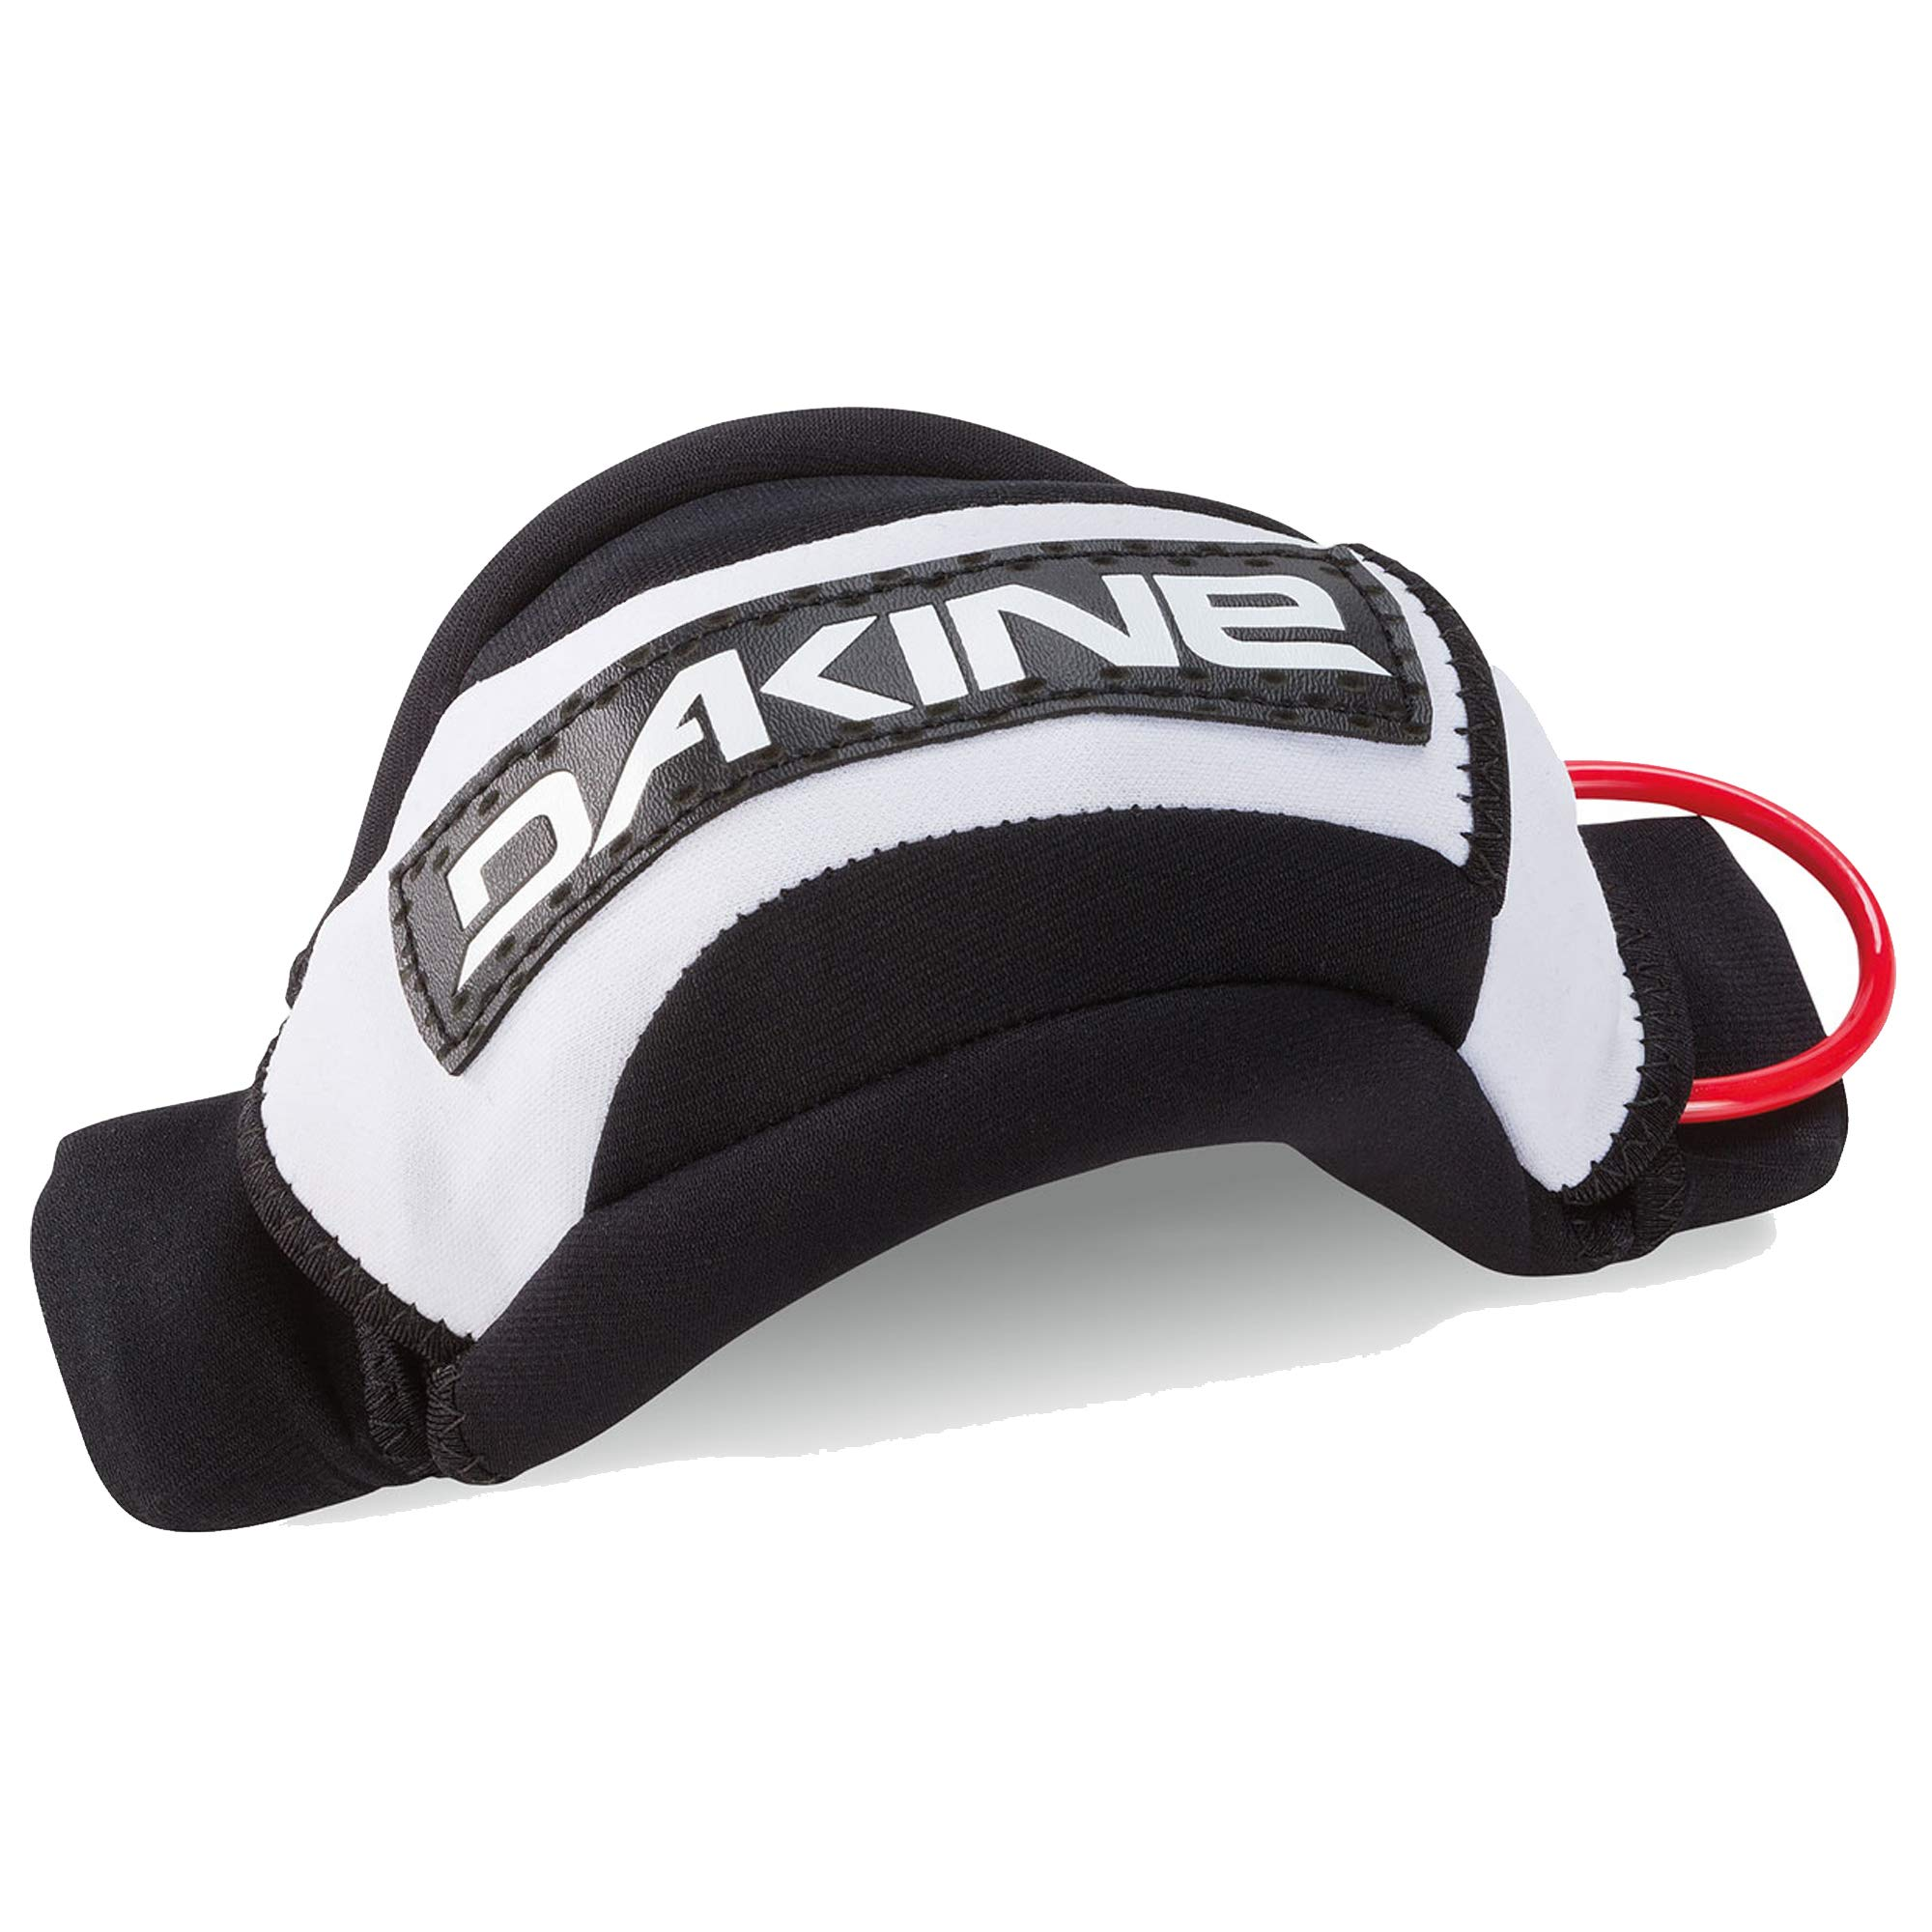 Dakine Unisex X-Lace Wave Windsurf Footstraps,White,One Size by Dakine